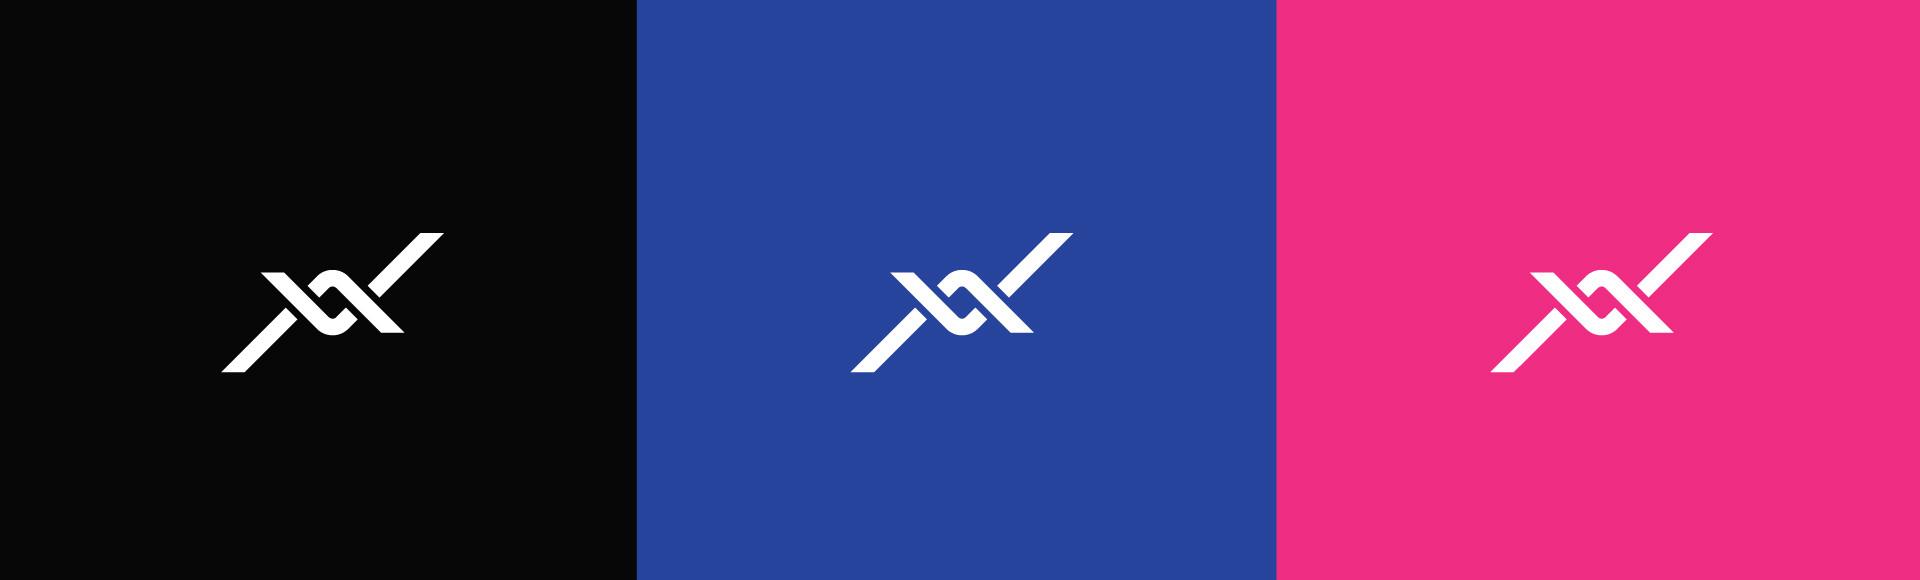 img-portfolio-optafx-voadora (5).jpg